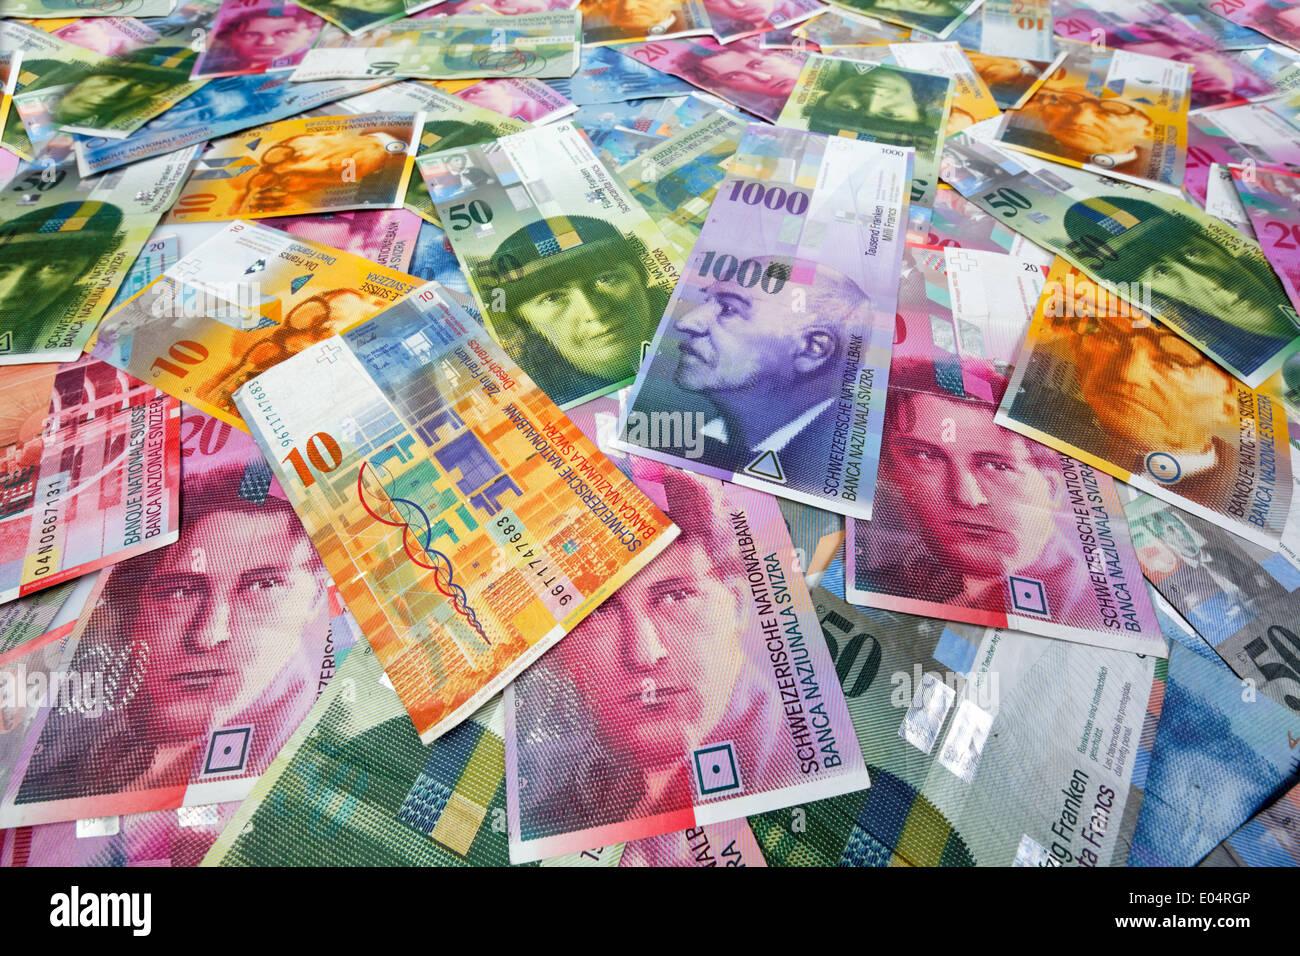 swiss francs money and currency of switzerland schweizer franken stock photo 68947782 alamy. Black Bedroom Furniture Sets. Home Design Ideas